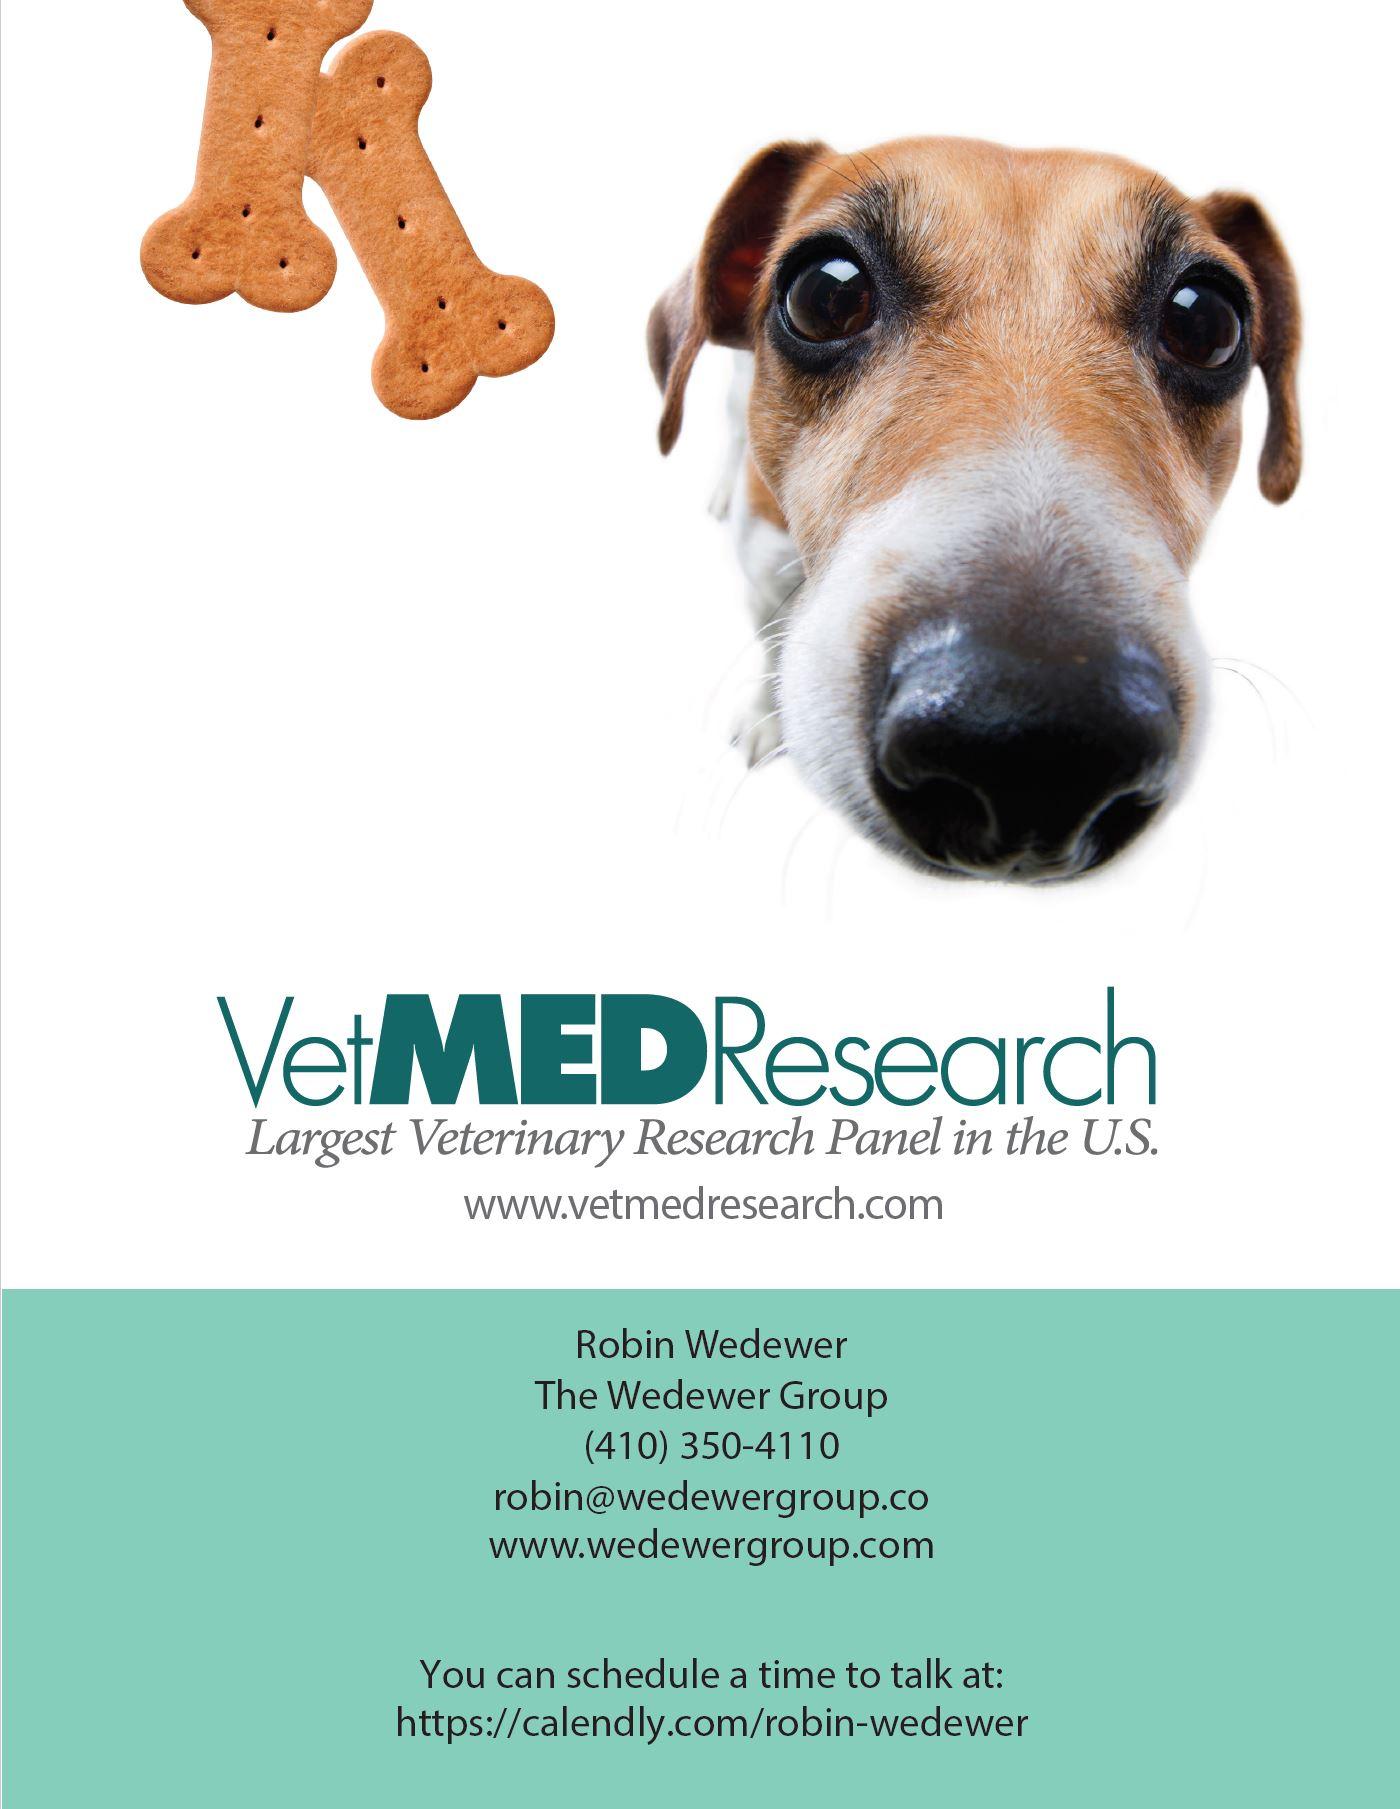 VetMEDResearch Panel Book Cover